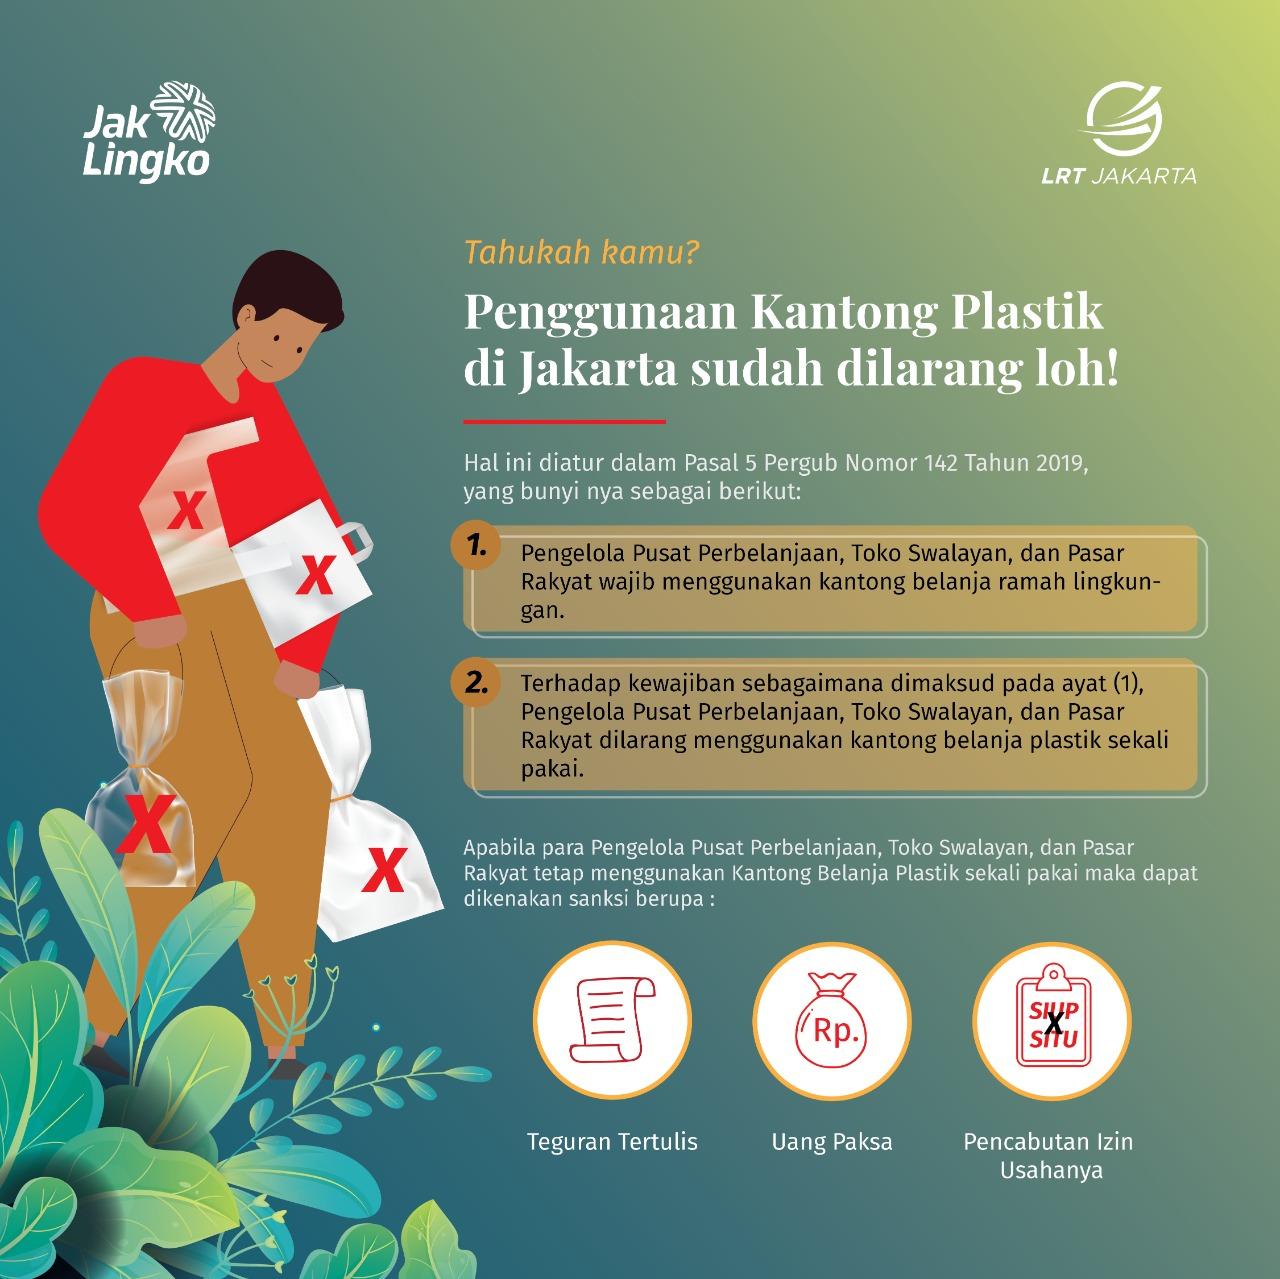 Tahukah Kamu? Penggunaan Kantong Plastik di Jakarta sudah dilarang loh!